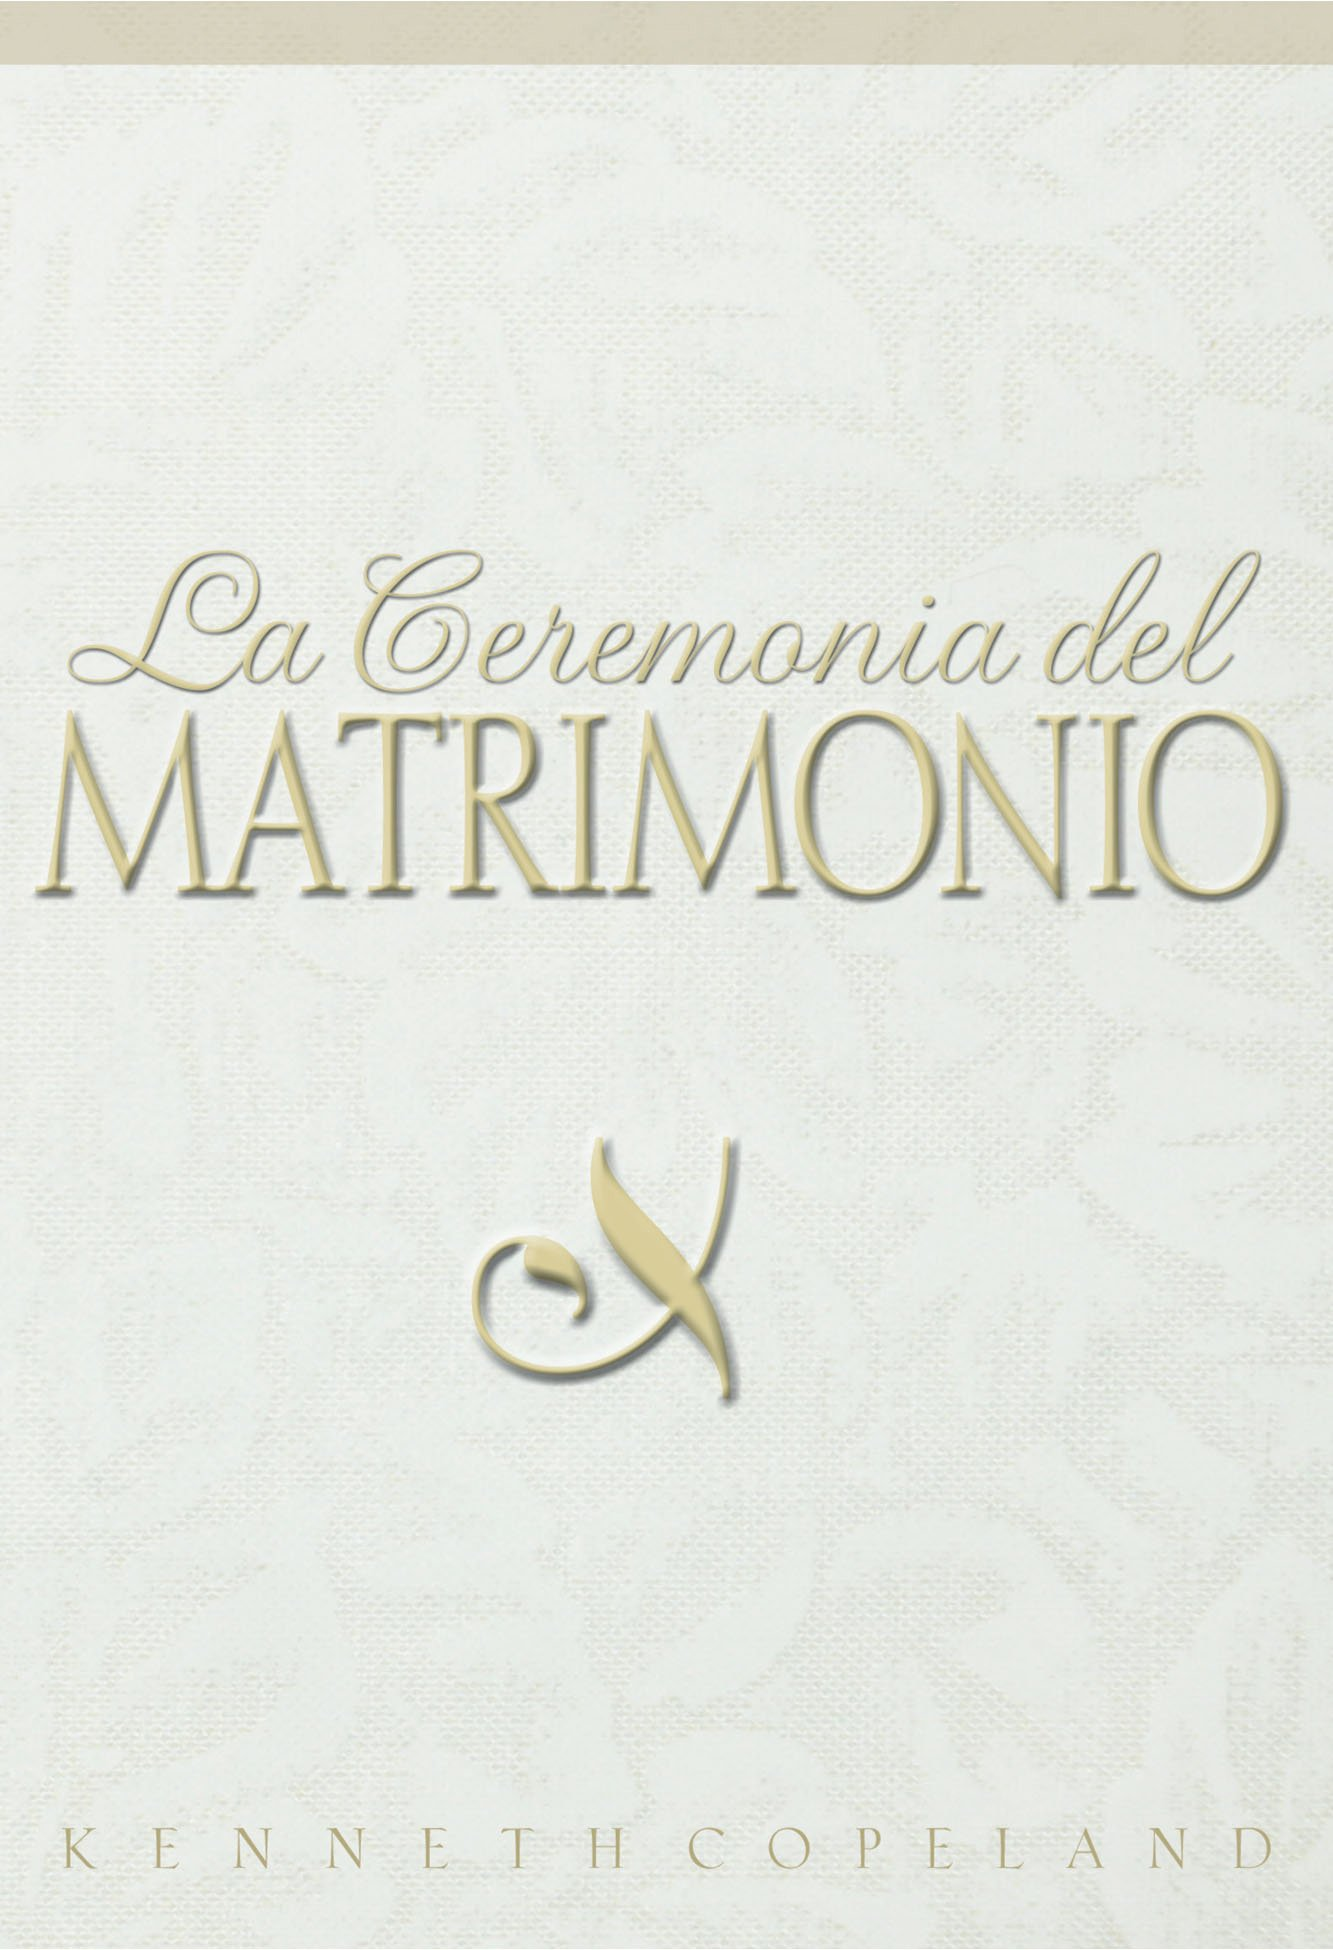 Download La Ceremonia del Matrimonio (Ceremony of Marriage) ebook